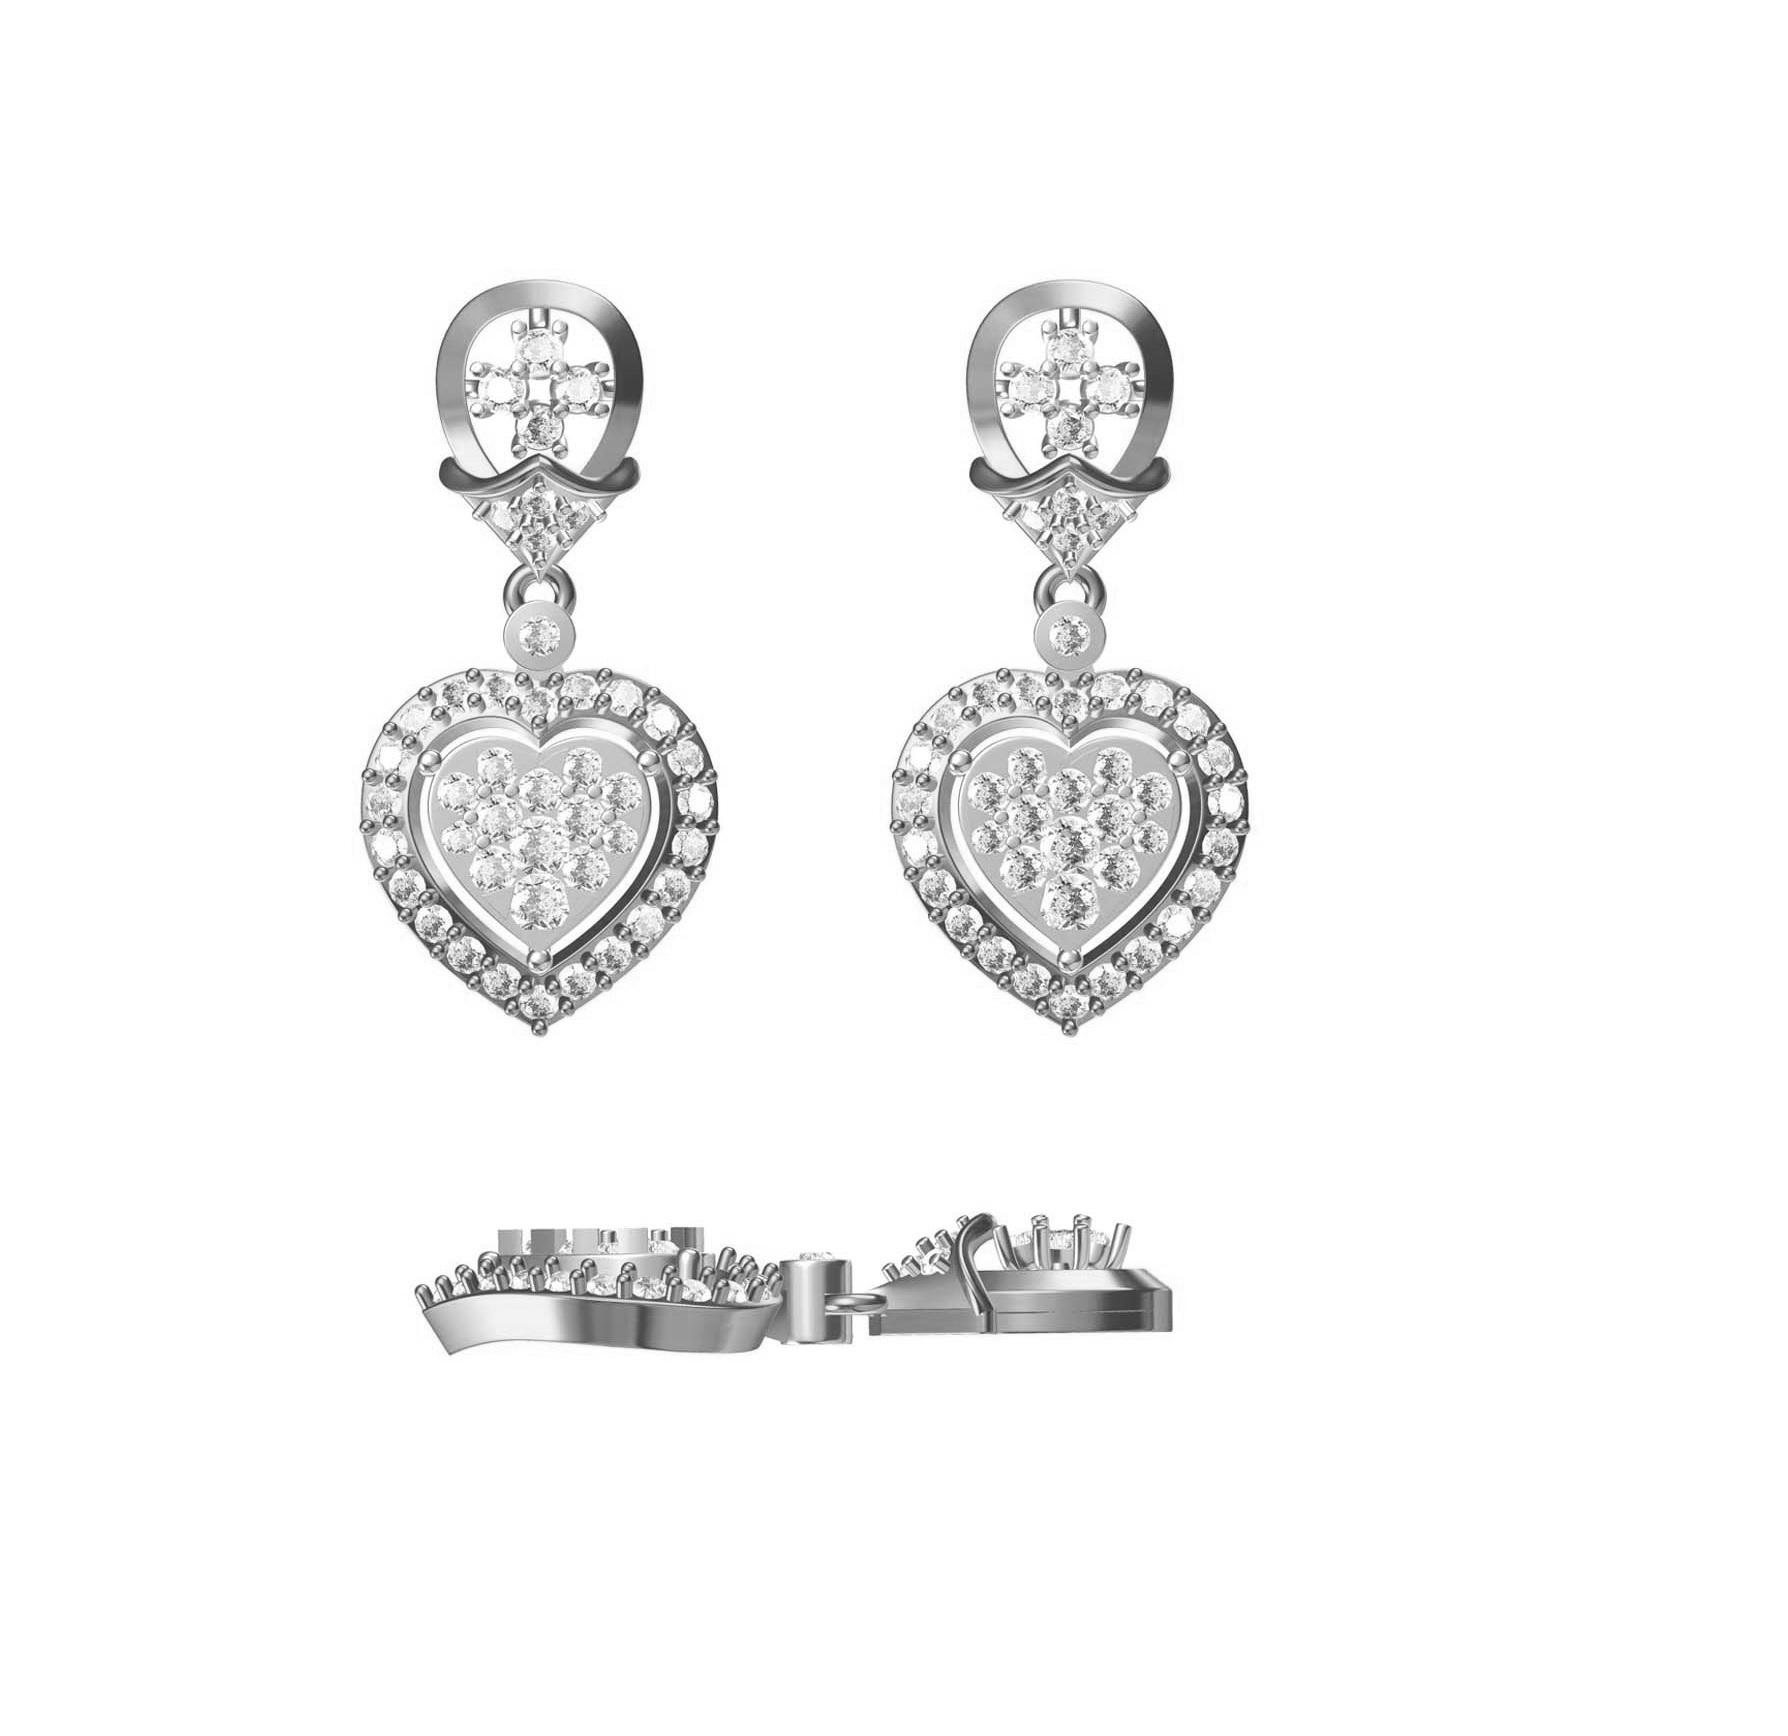 Diamond Earring TCW 1.62 14K gold 6.1 gm